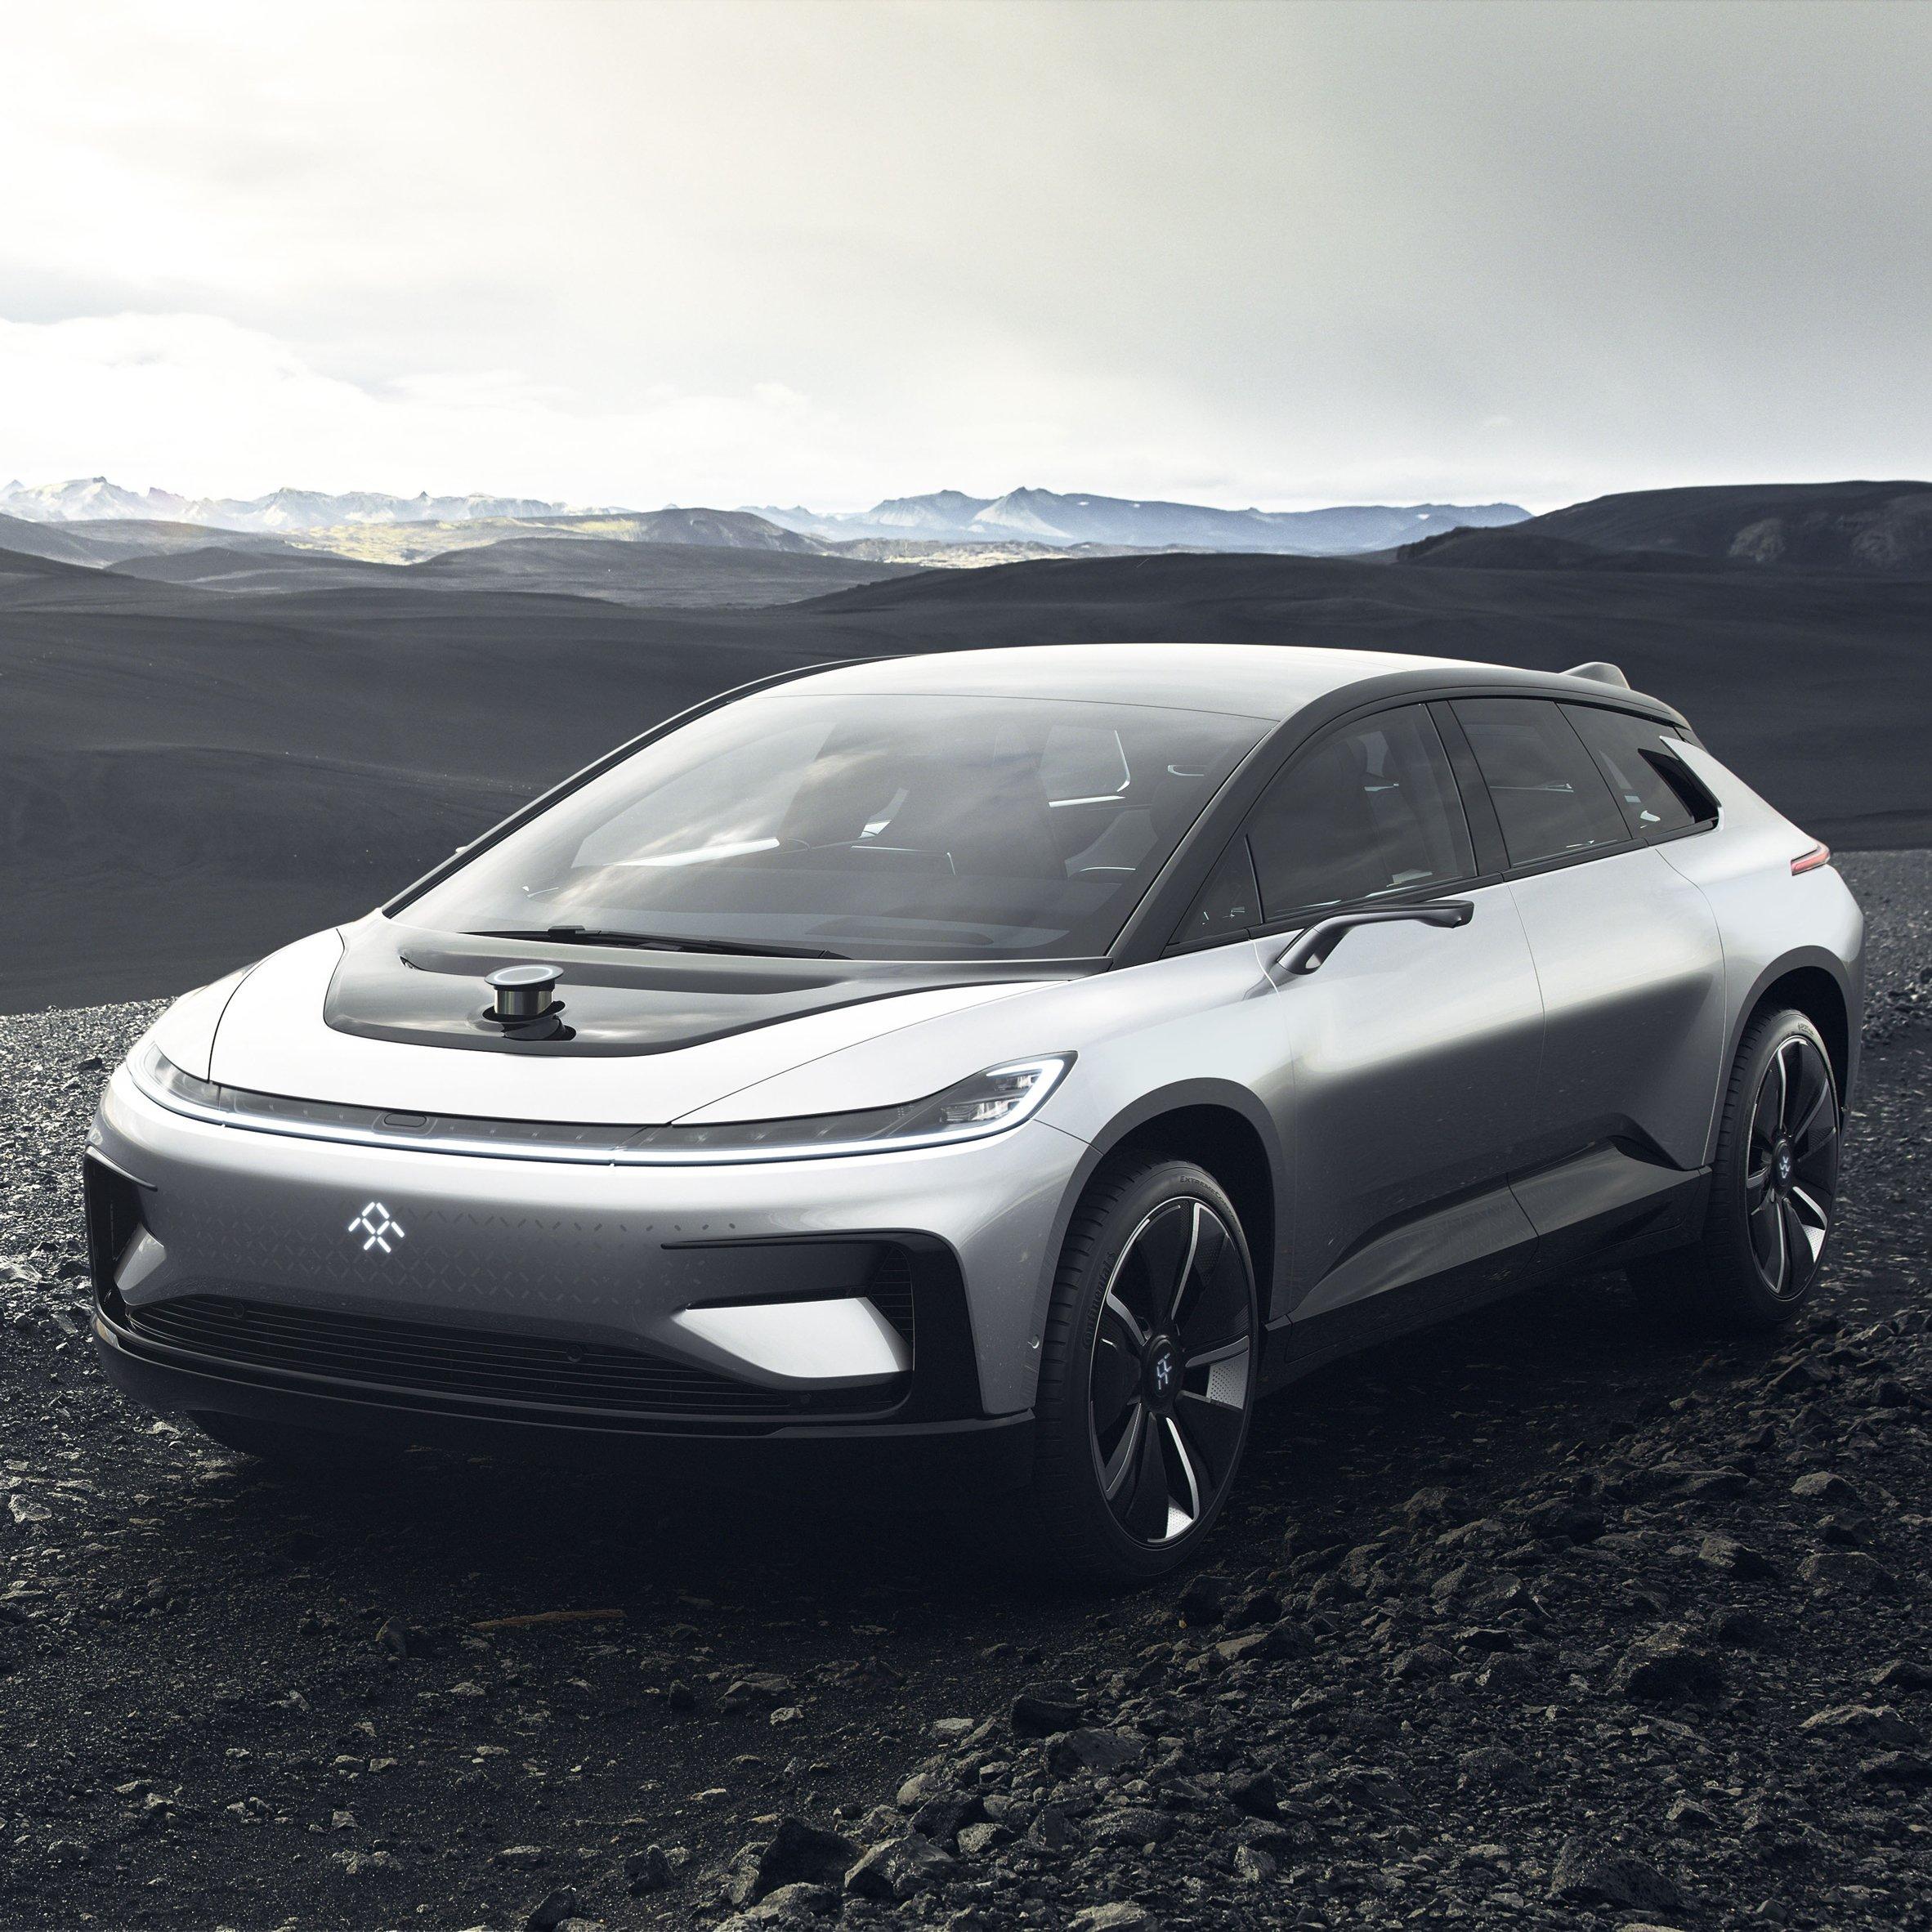 ff91-electric-car-transport-design-vehicles-ces-2017_dezeen_sq